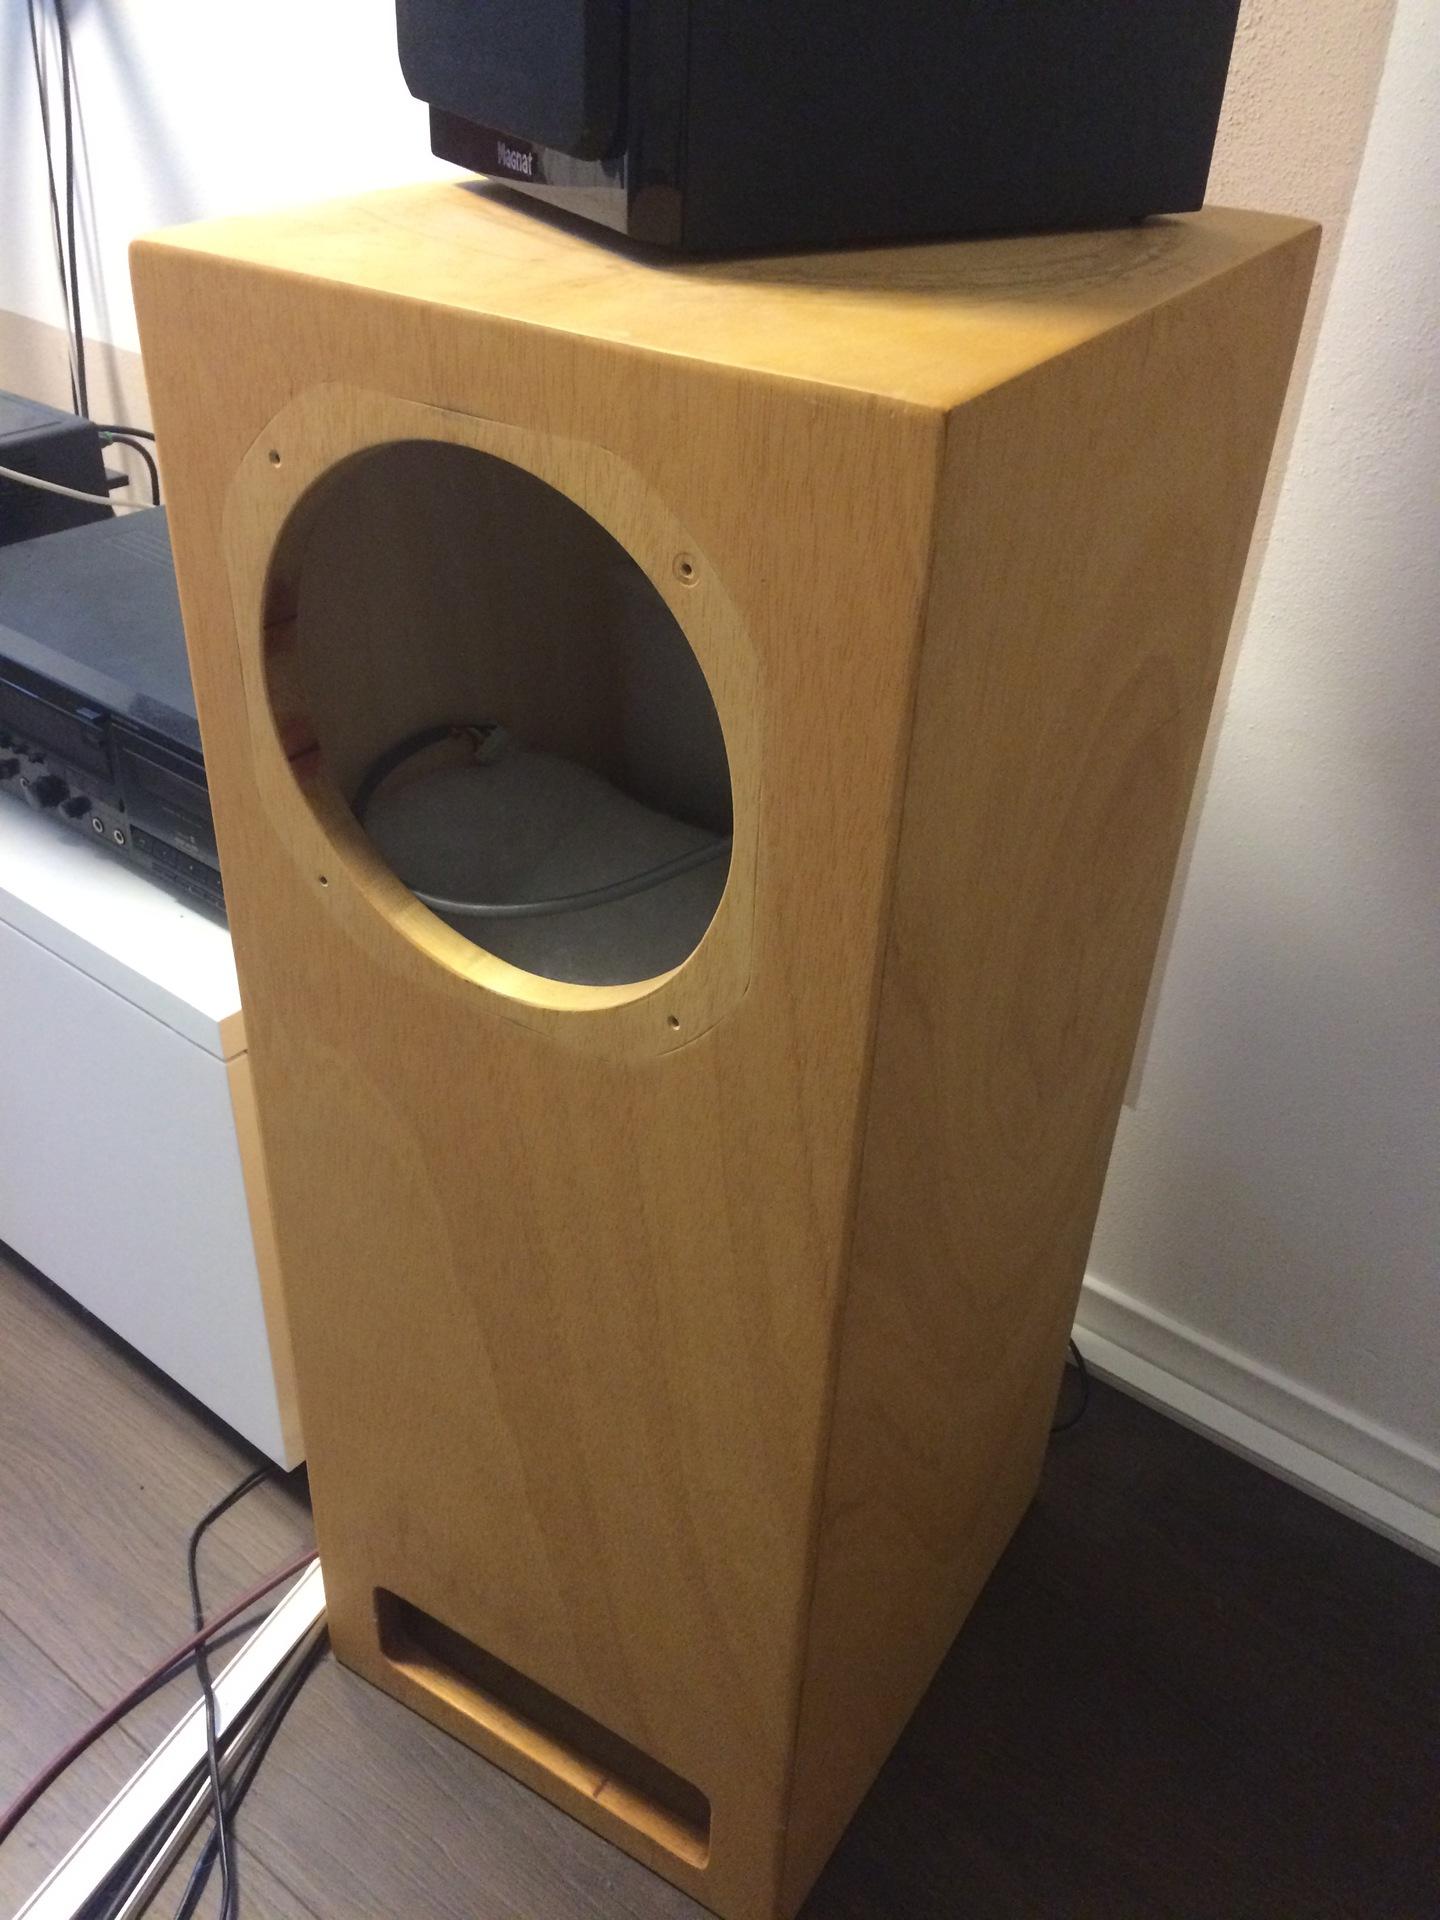 geh use diy mit tannoy technik diy geh use heimkino. Black Bedroom Furniture Sets. Home Design Ideas